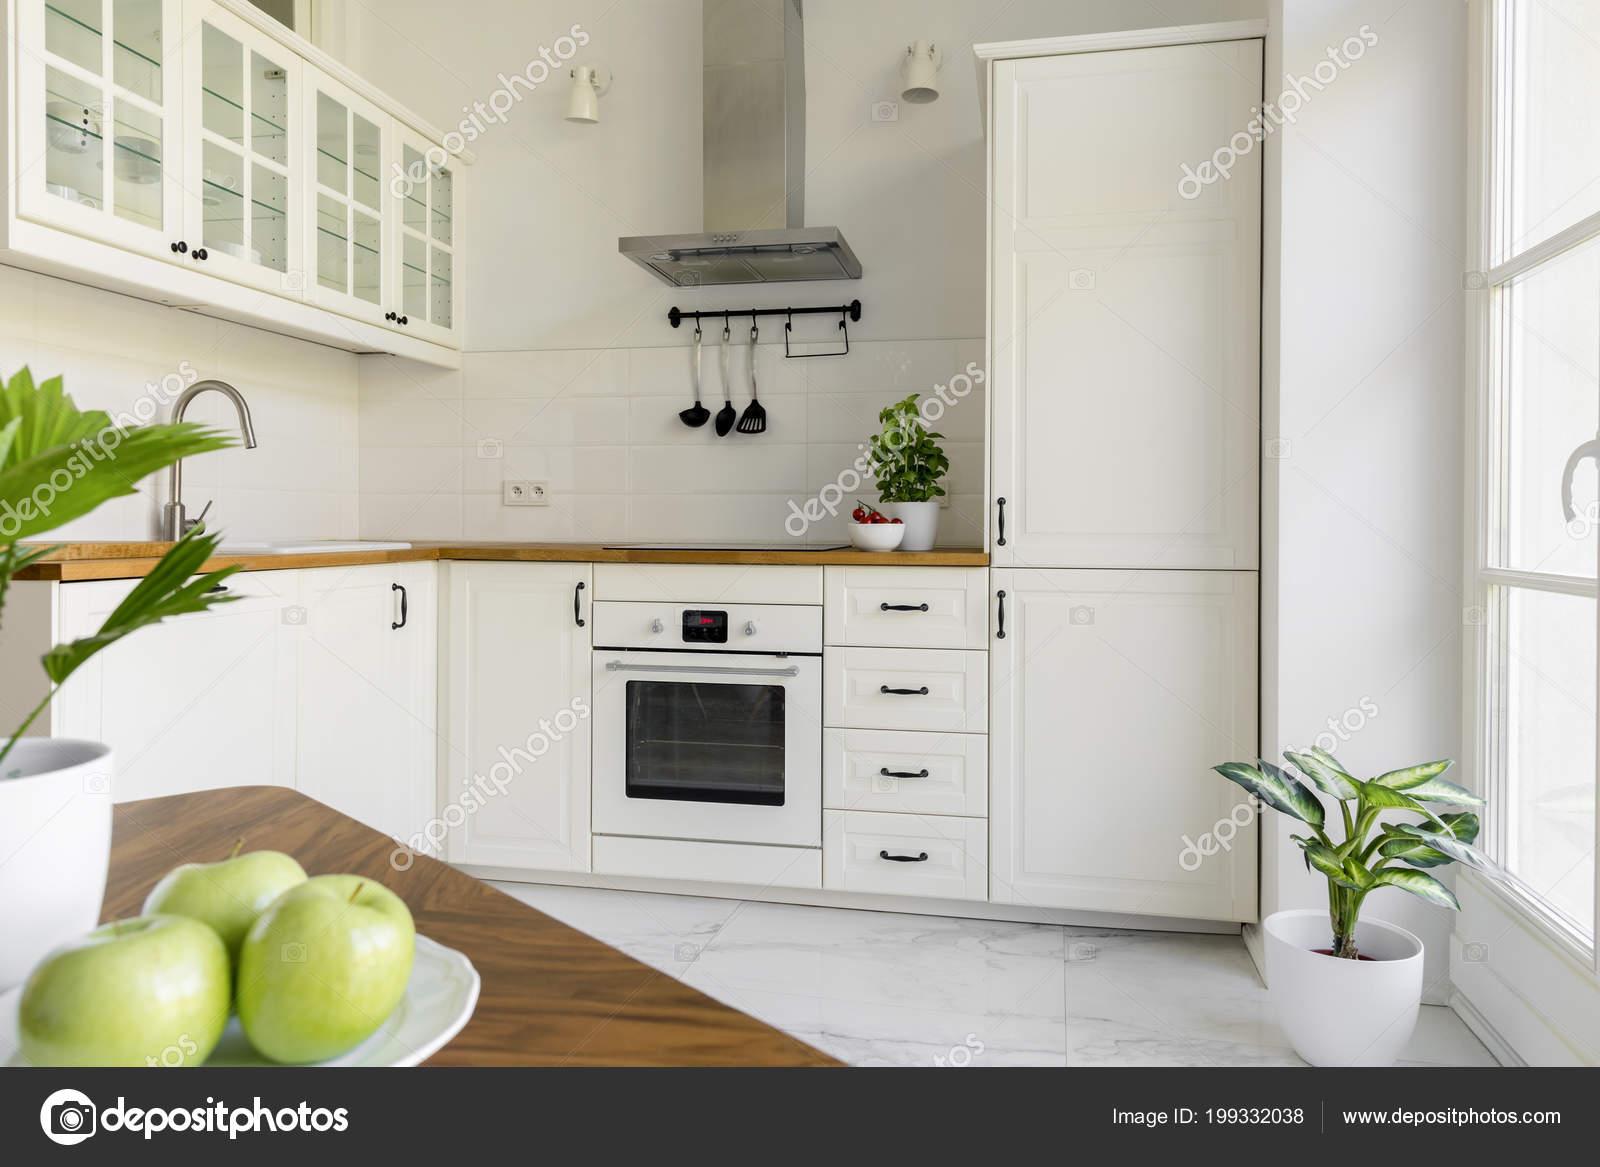 Pianta Interiore Bianco Cucina Minimal Con Argento Cappa ...